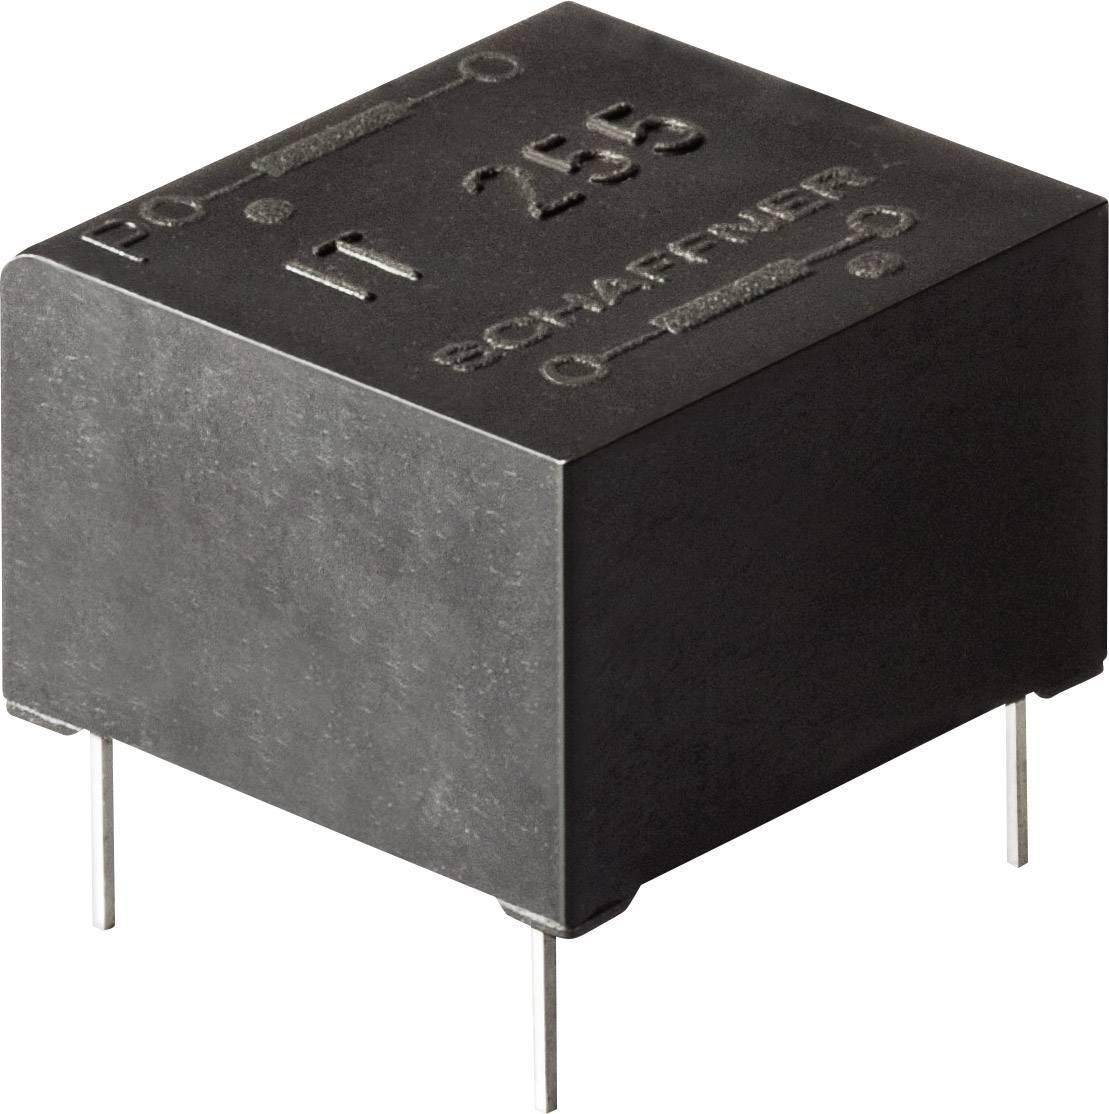 Pulzní transformátor Schaffner, IT248, 17 mH, max 3000 V